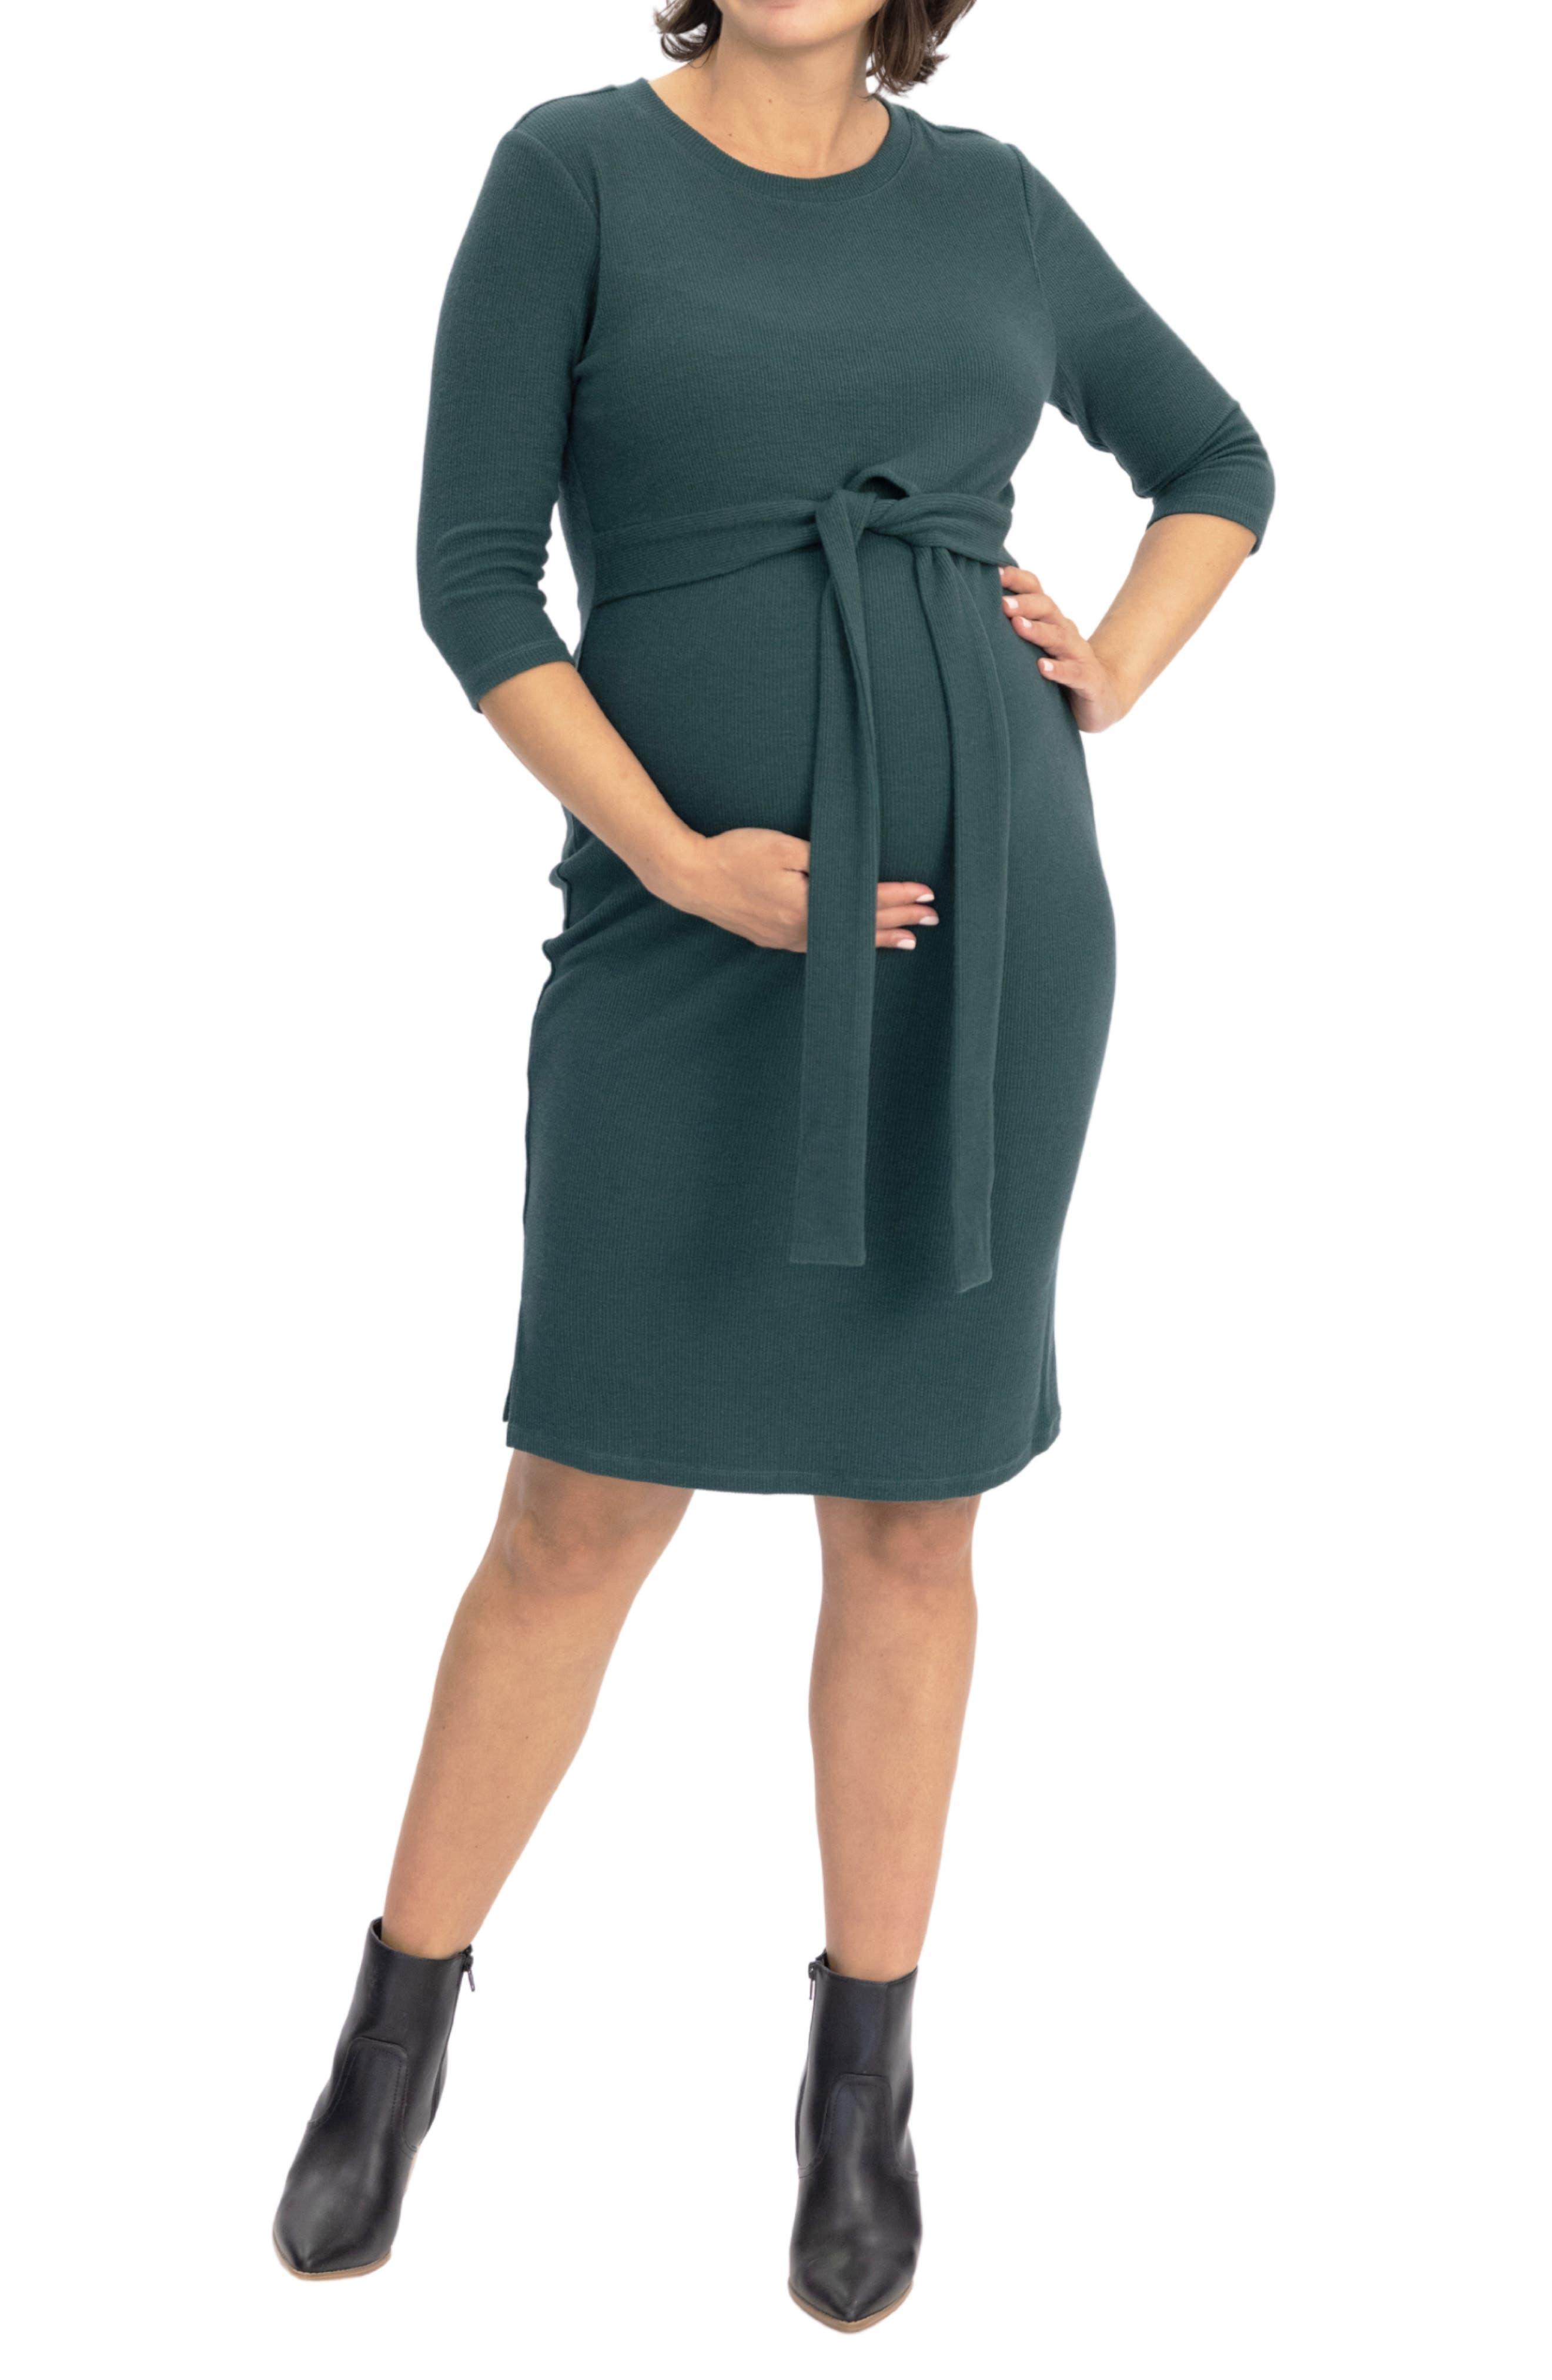 Tie Waist Maternity/nursing Dress